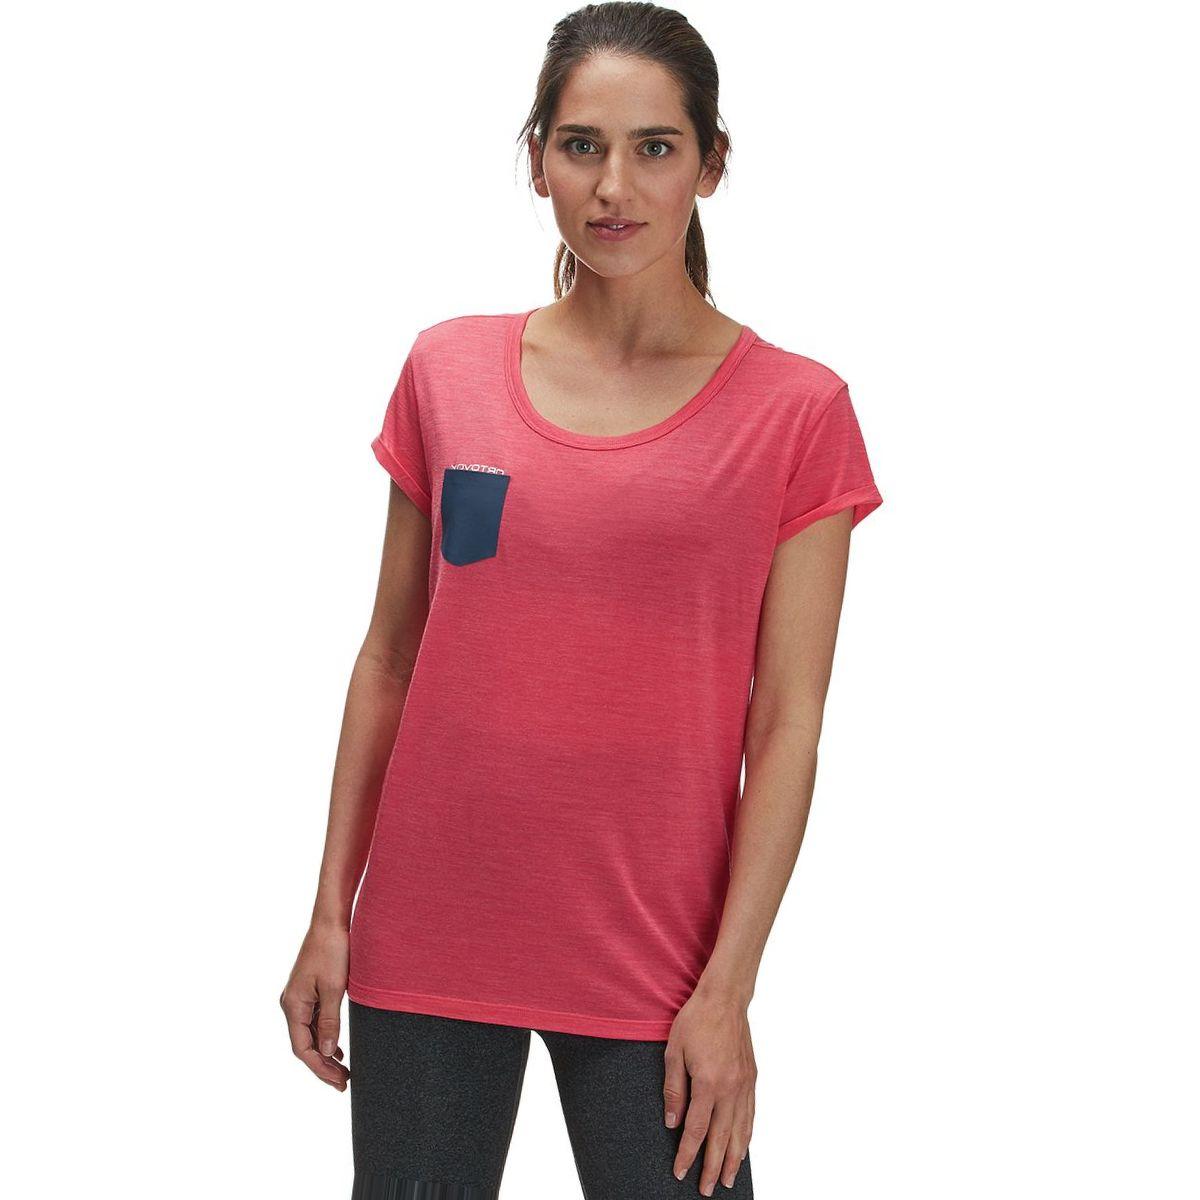 Ortovox 120 Cool Tec T-Shirt - Women's